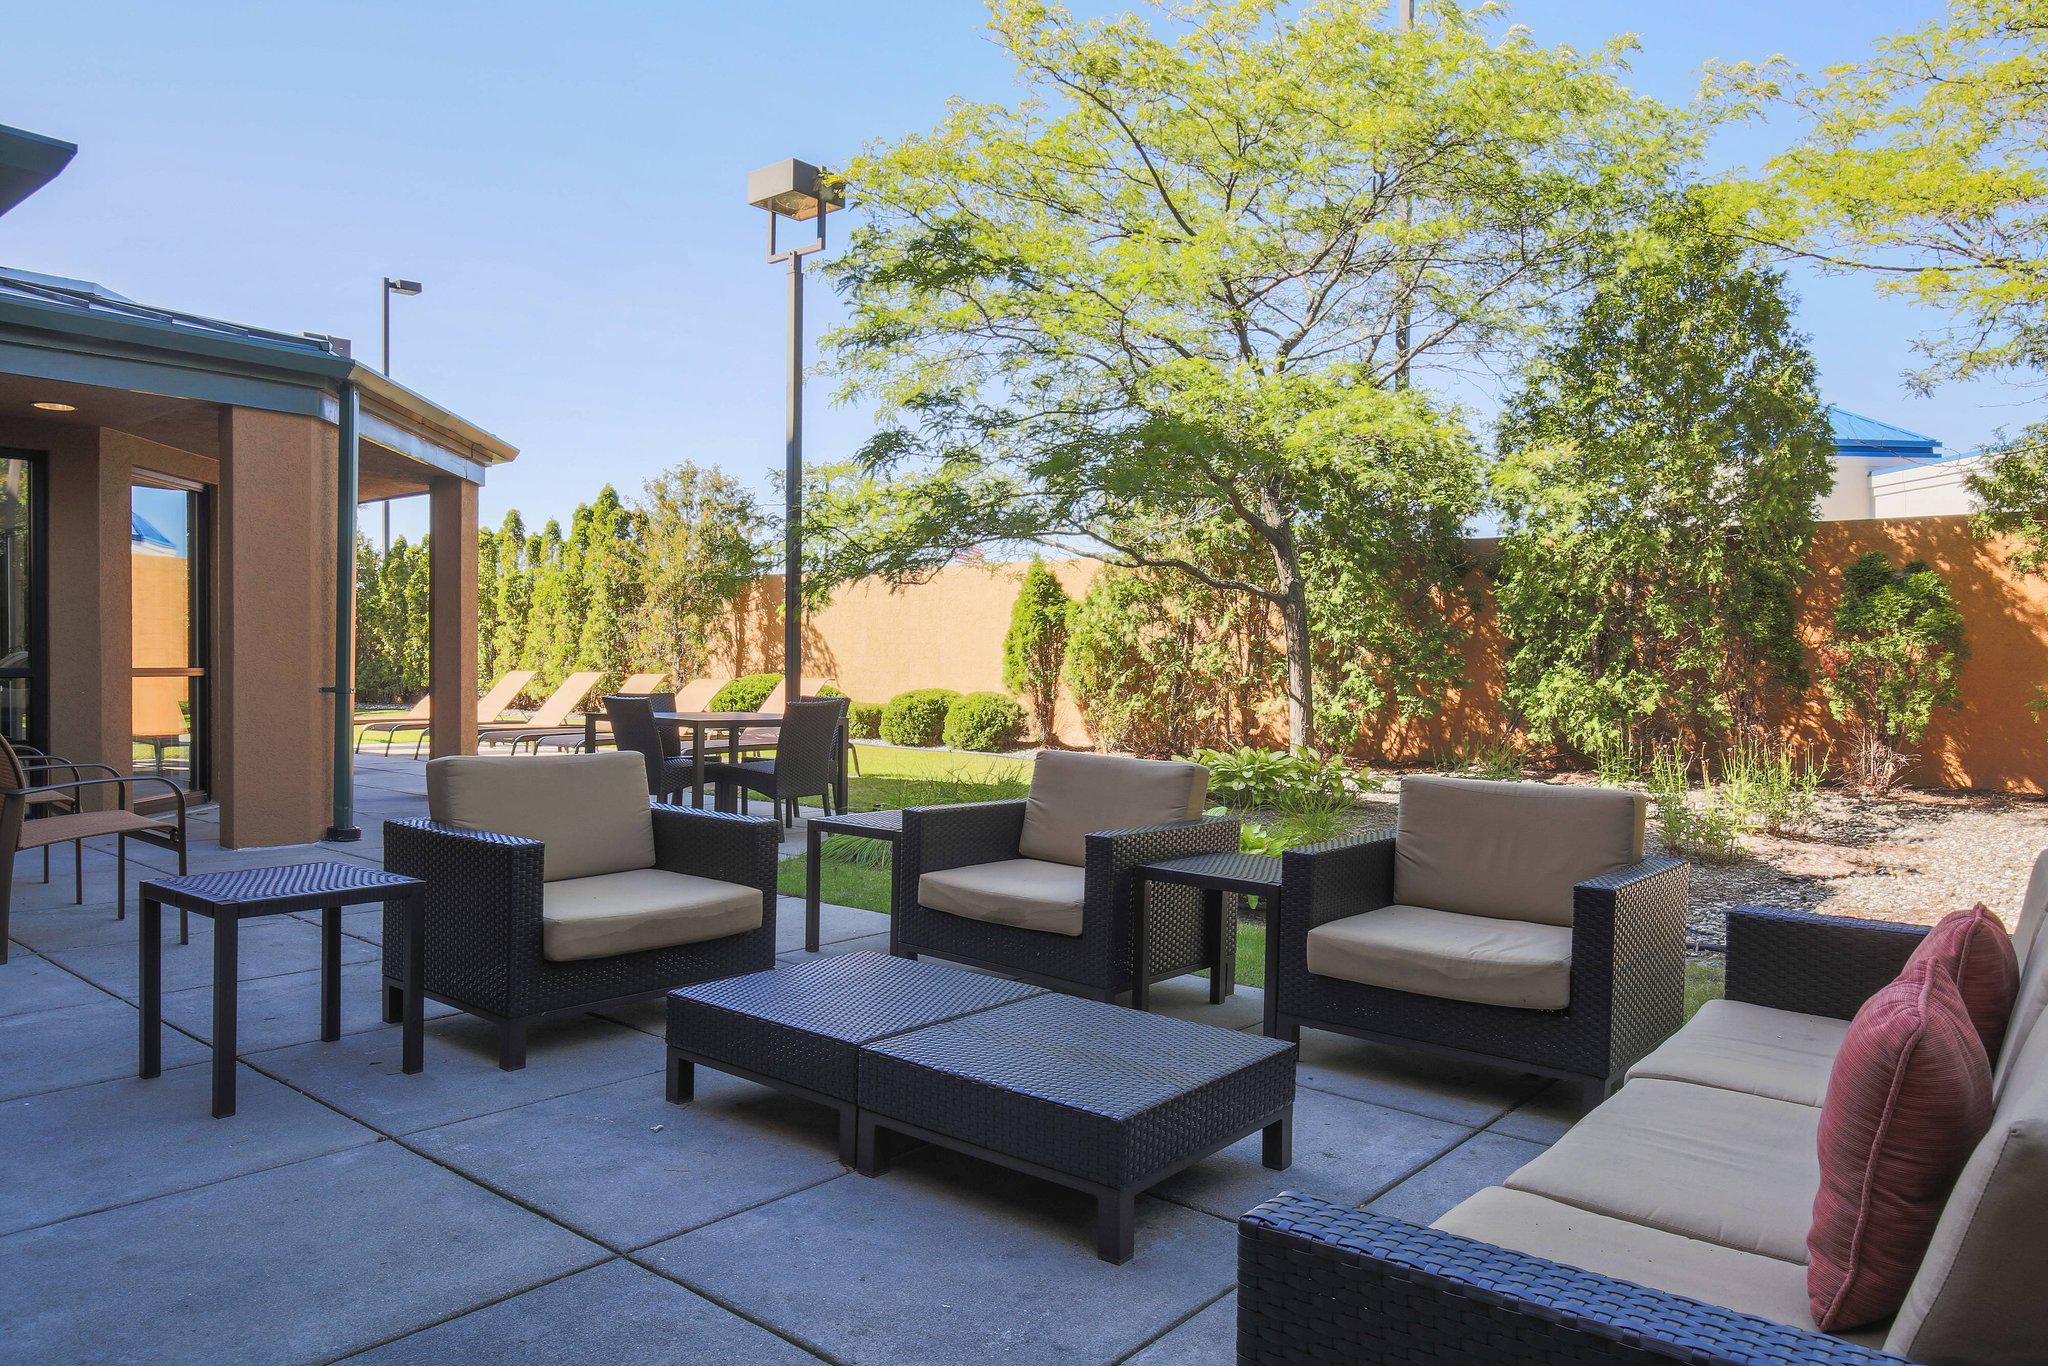 Courtyard by Marriott Flint Grand Blanc